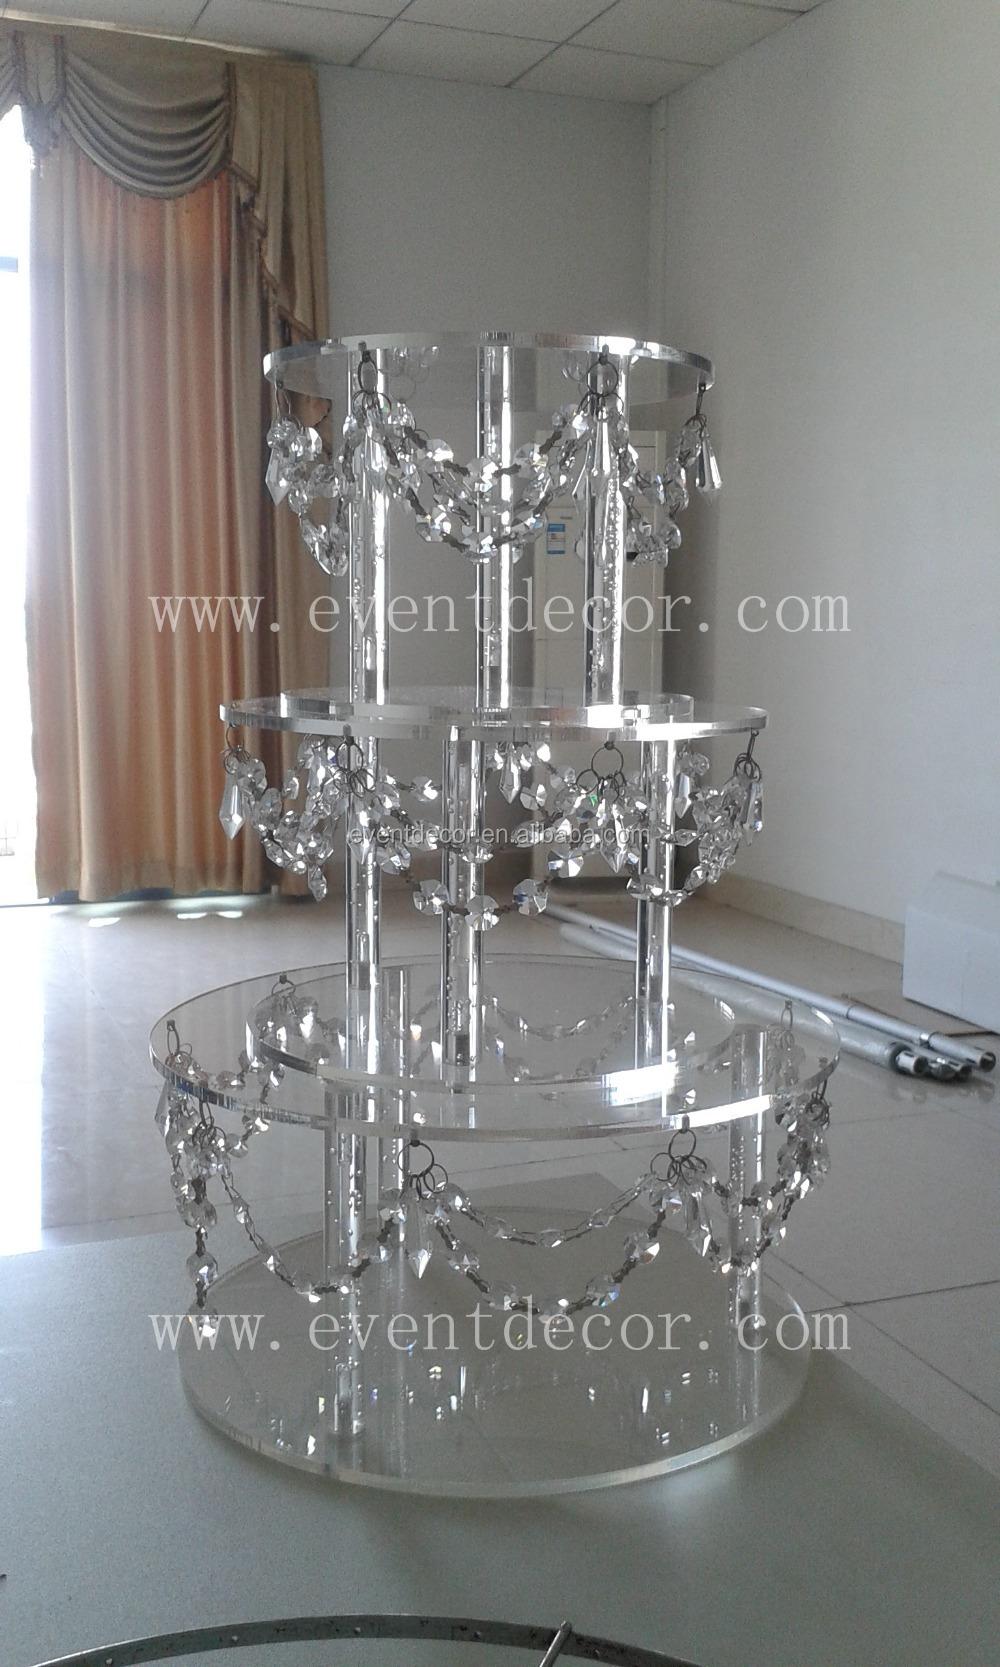 Wholesale Crystal Acrylic Cake Stand Decorative Hanging